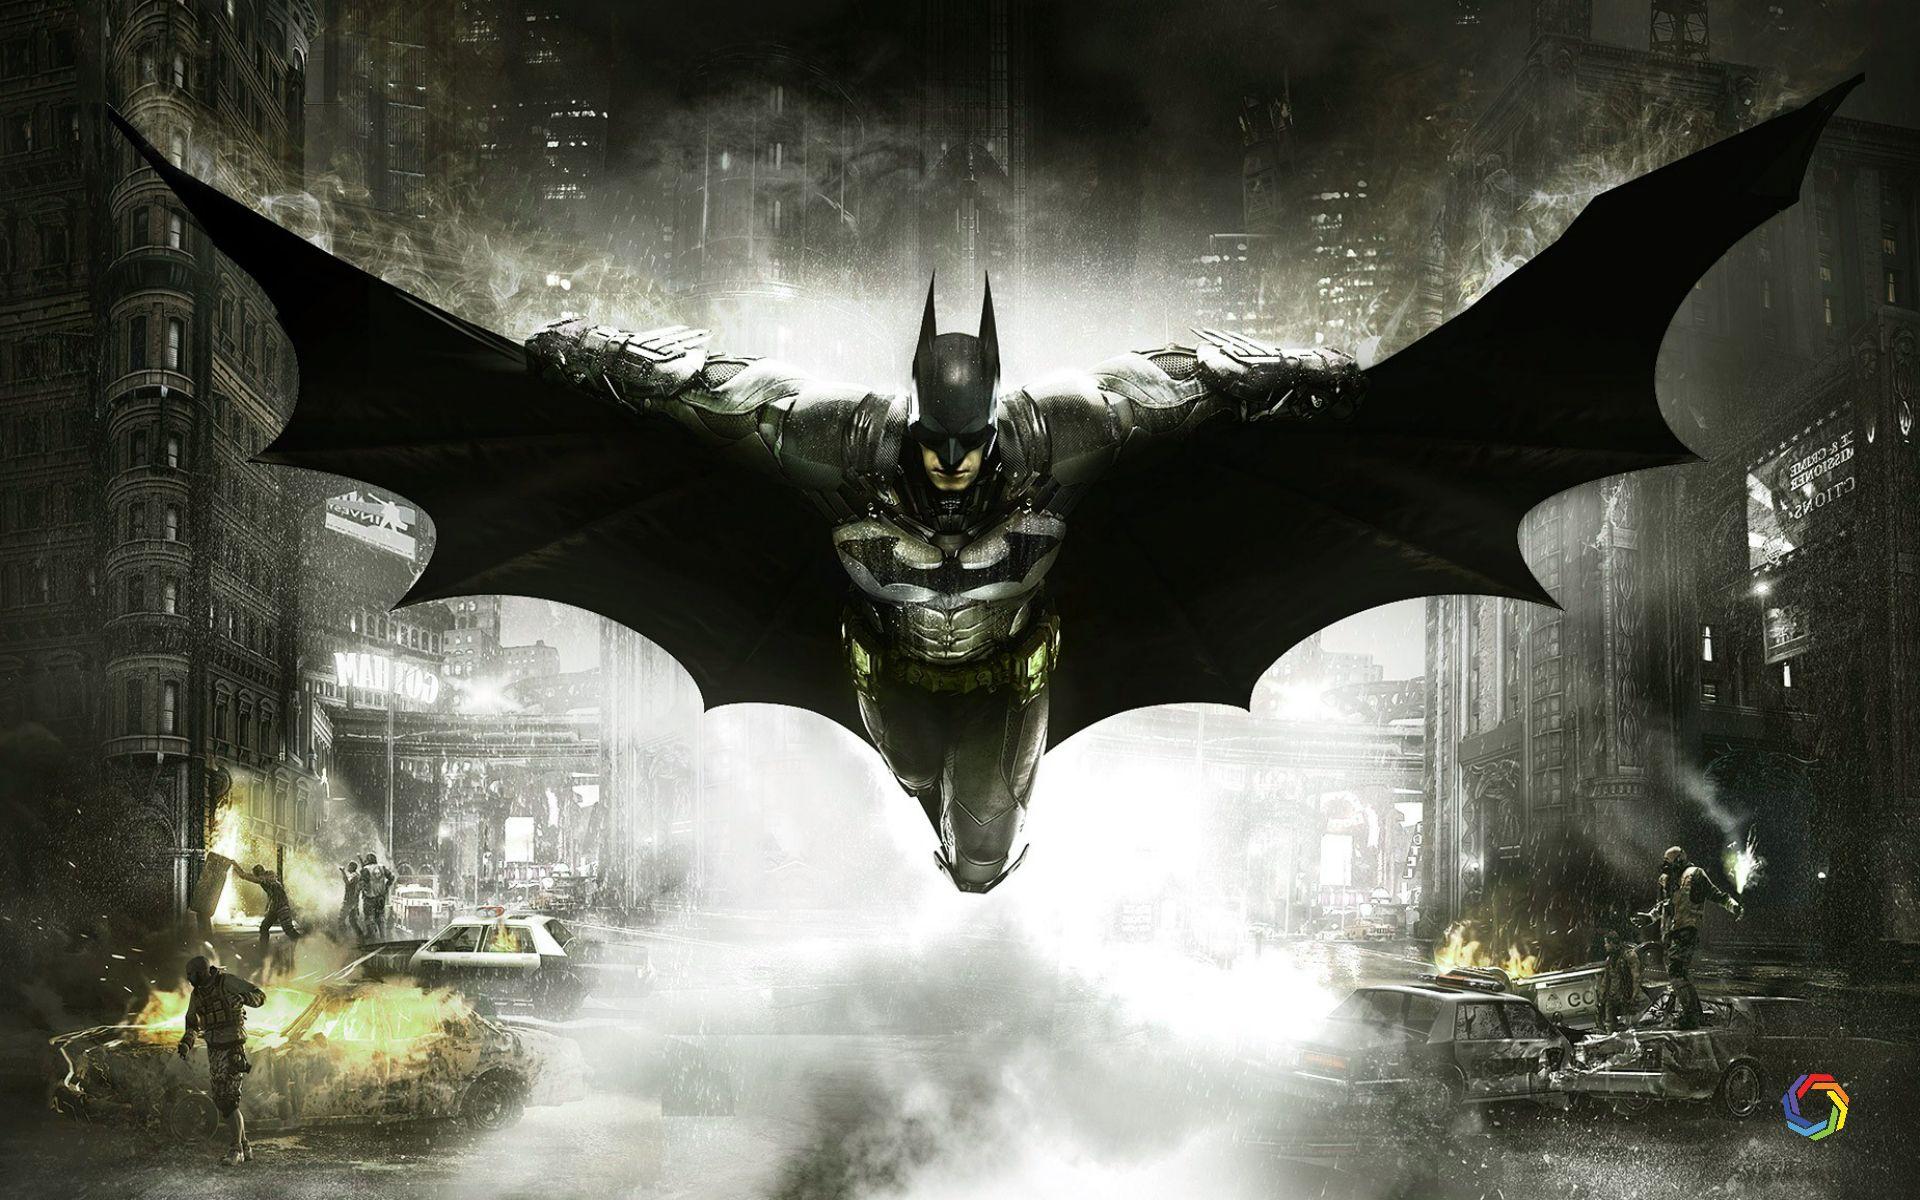 Download Knight Batman Movies Full Hd Wallpaper Hd Widescreen Wallpaper Or High D Batman Arkham Knight Wallpaper Batman Arkham Knight Batman Arkham Knight Game